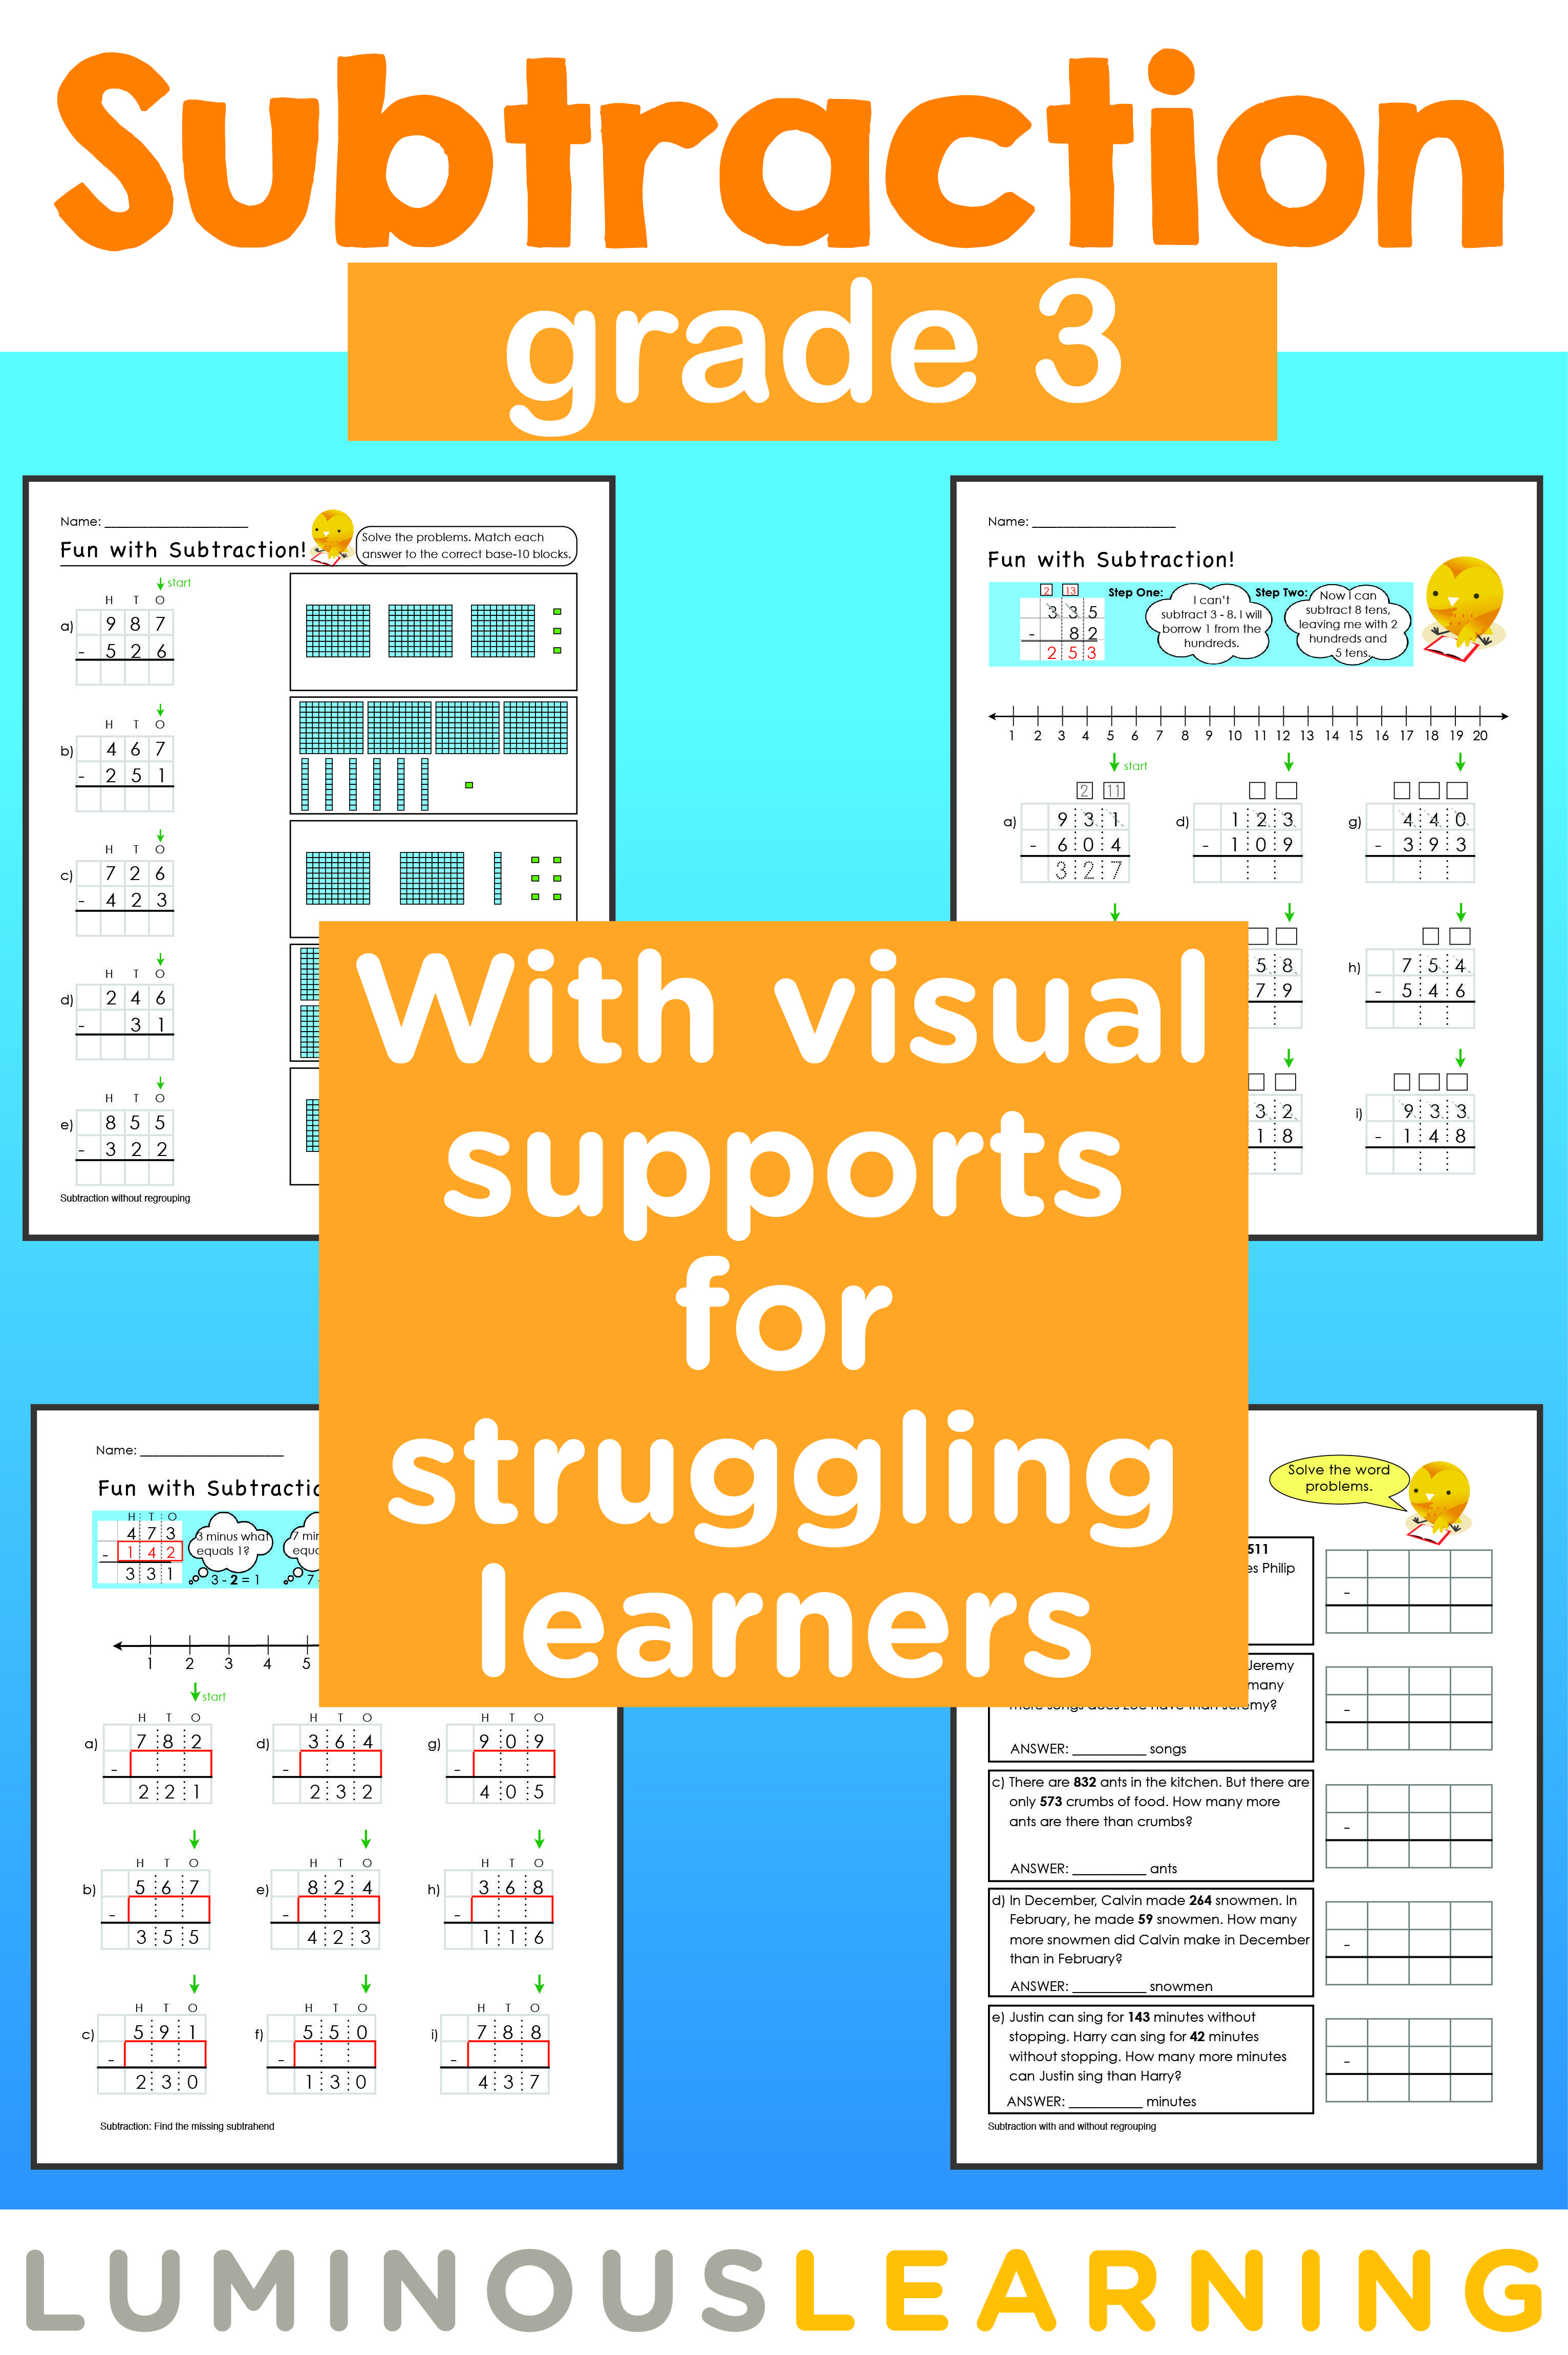 Luminous Learning Grade 3 Subtraction Workbook Making